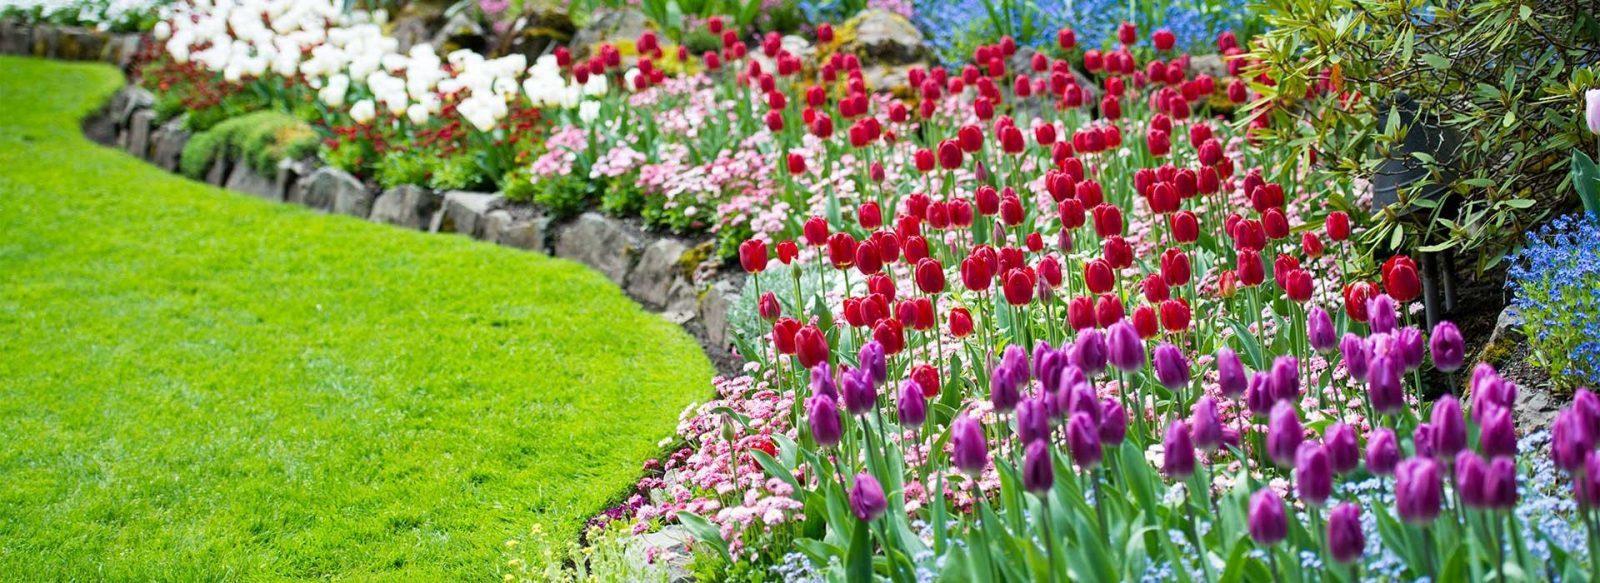 The Four Basic Principles Of The Good Garden Designer